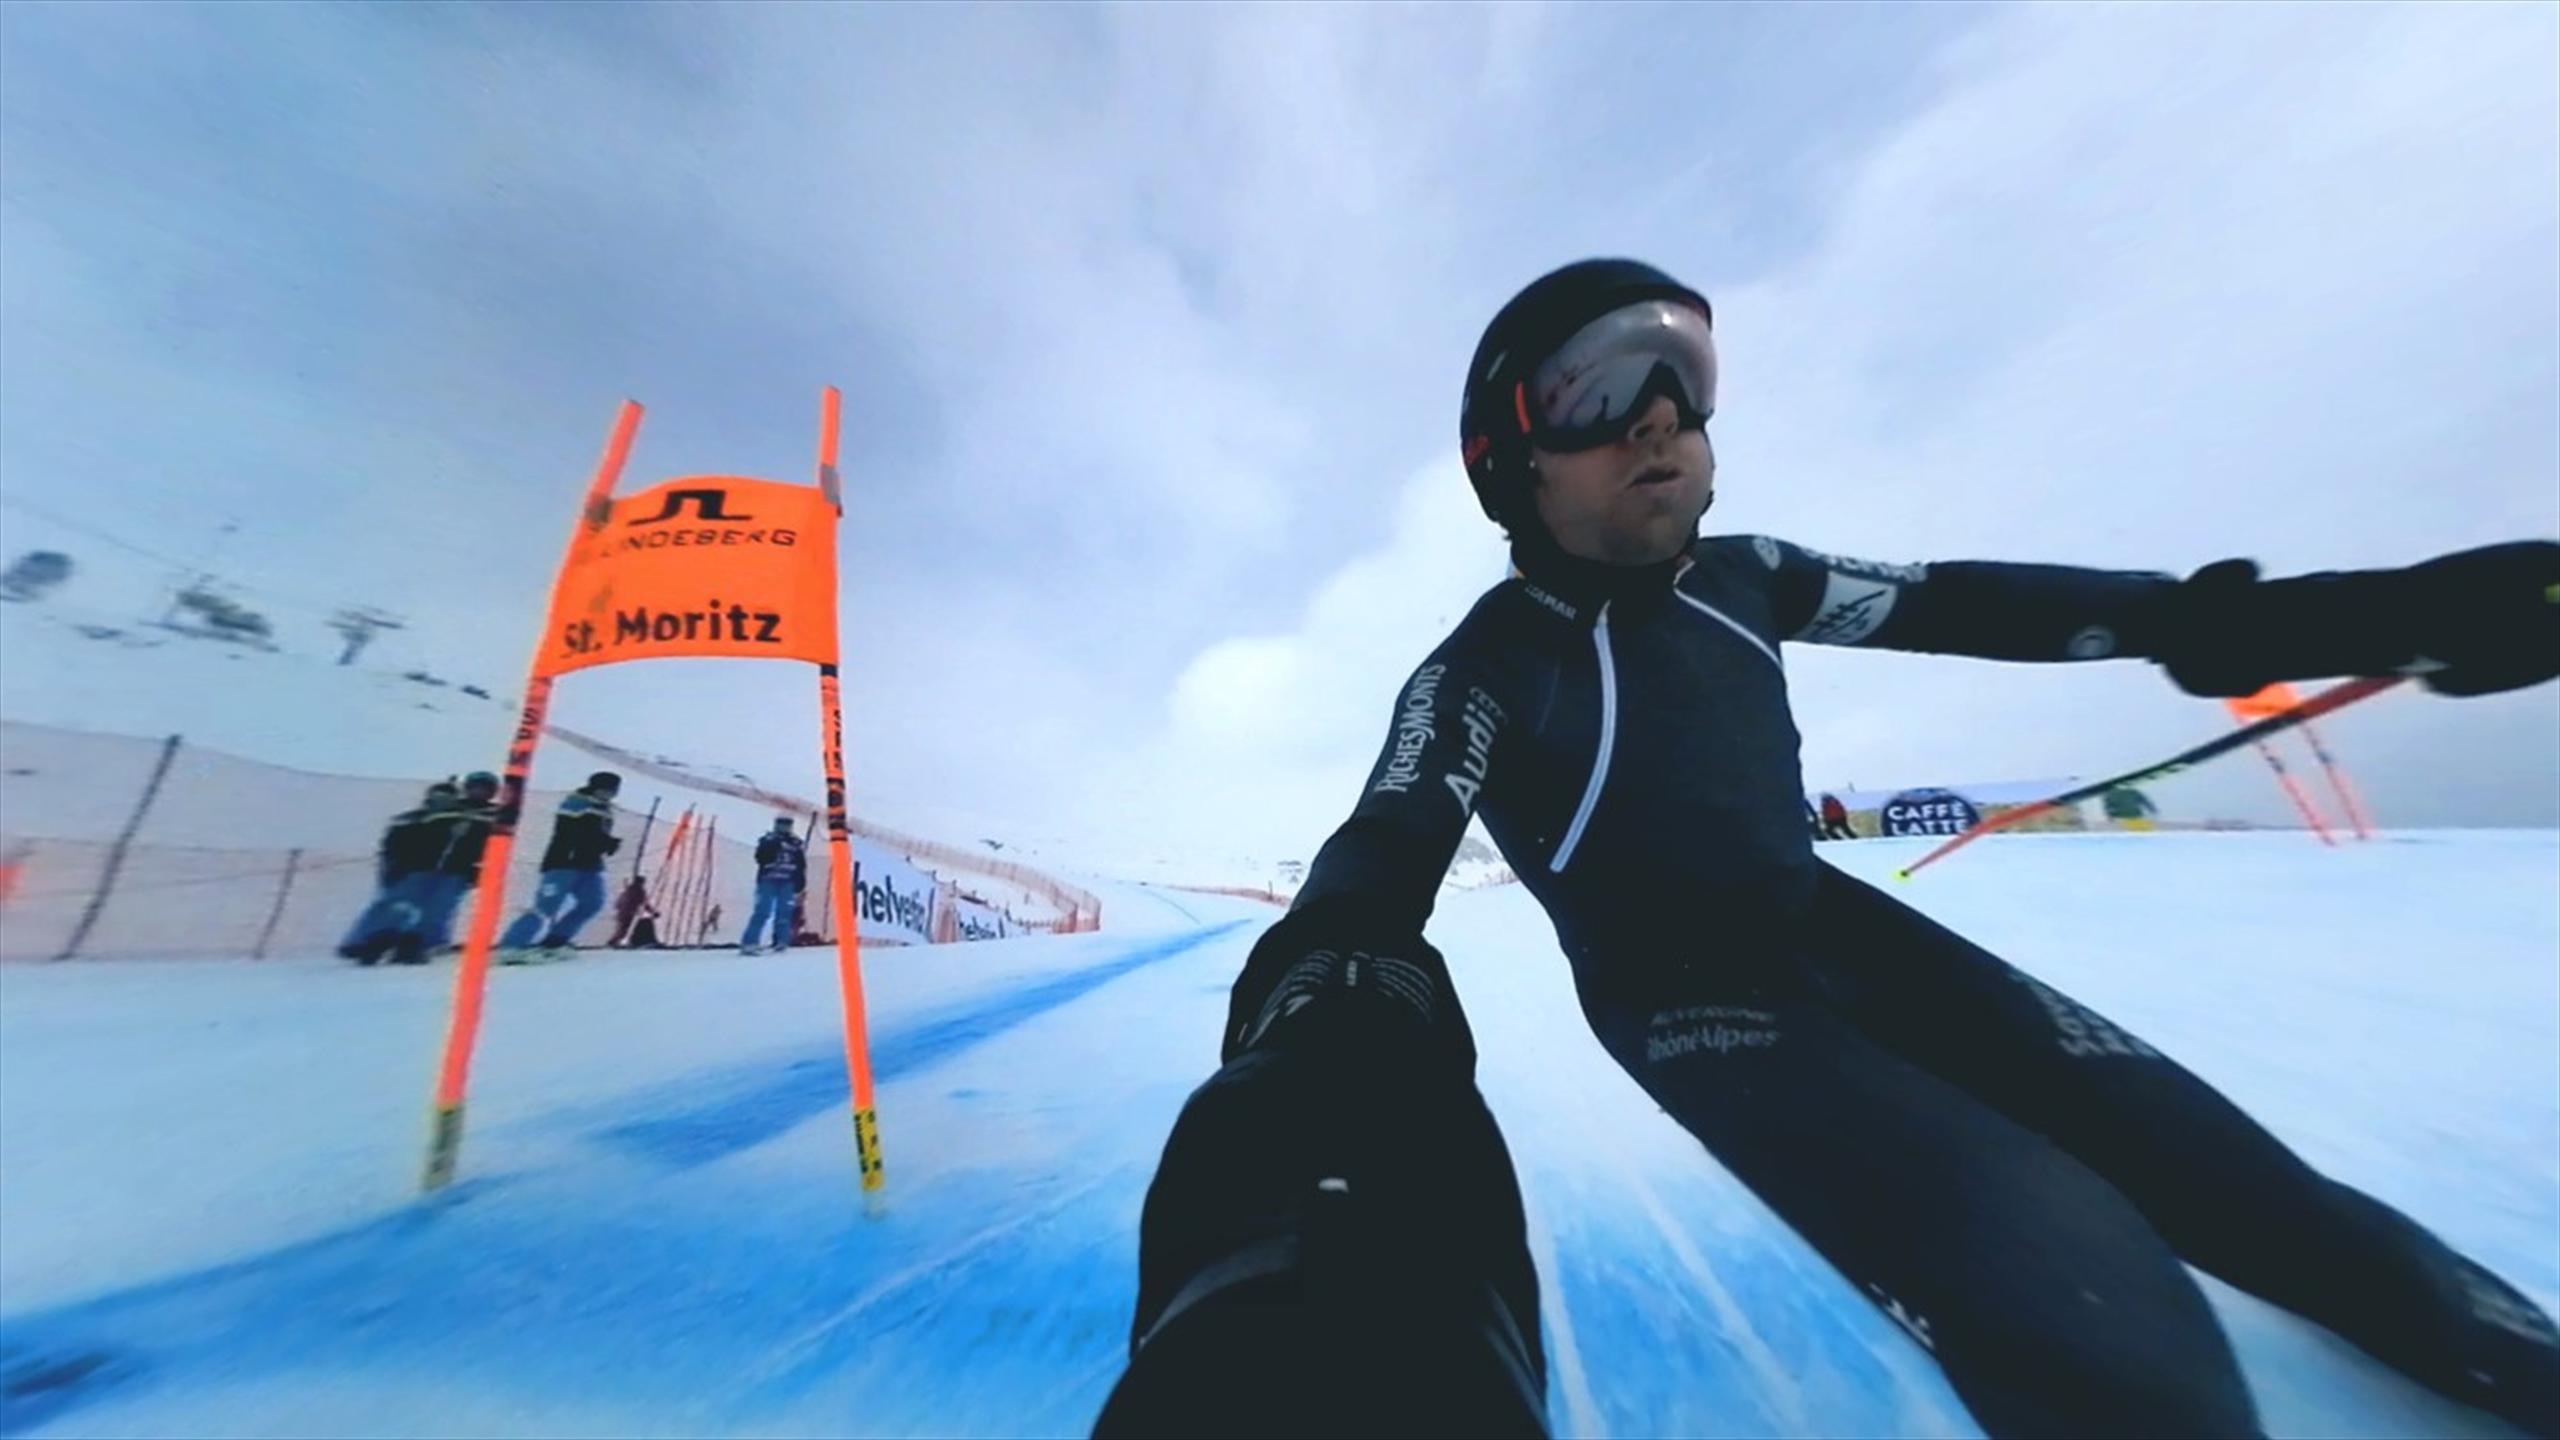 Онлайн секс на горных лыжах